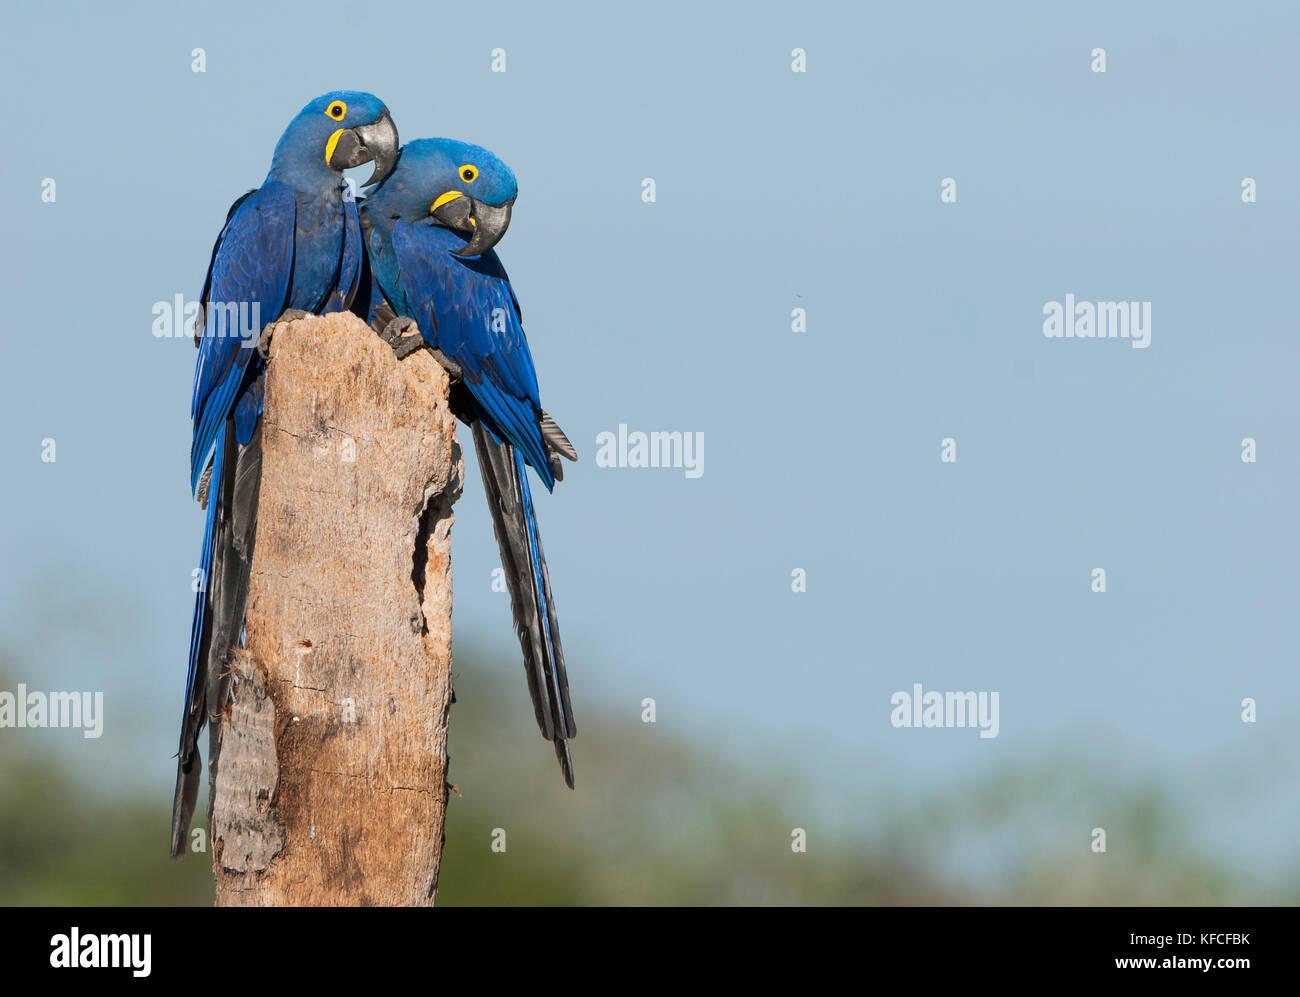 Hyacinth Macaw pair in the Pantanal - Stock Image